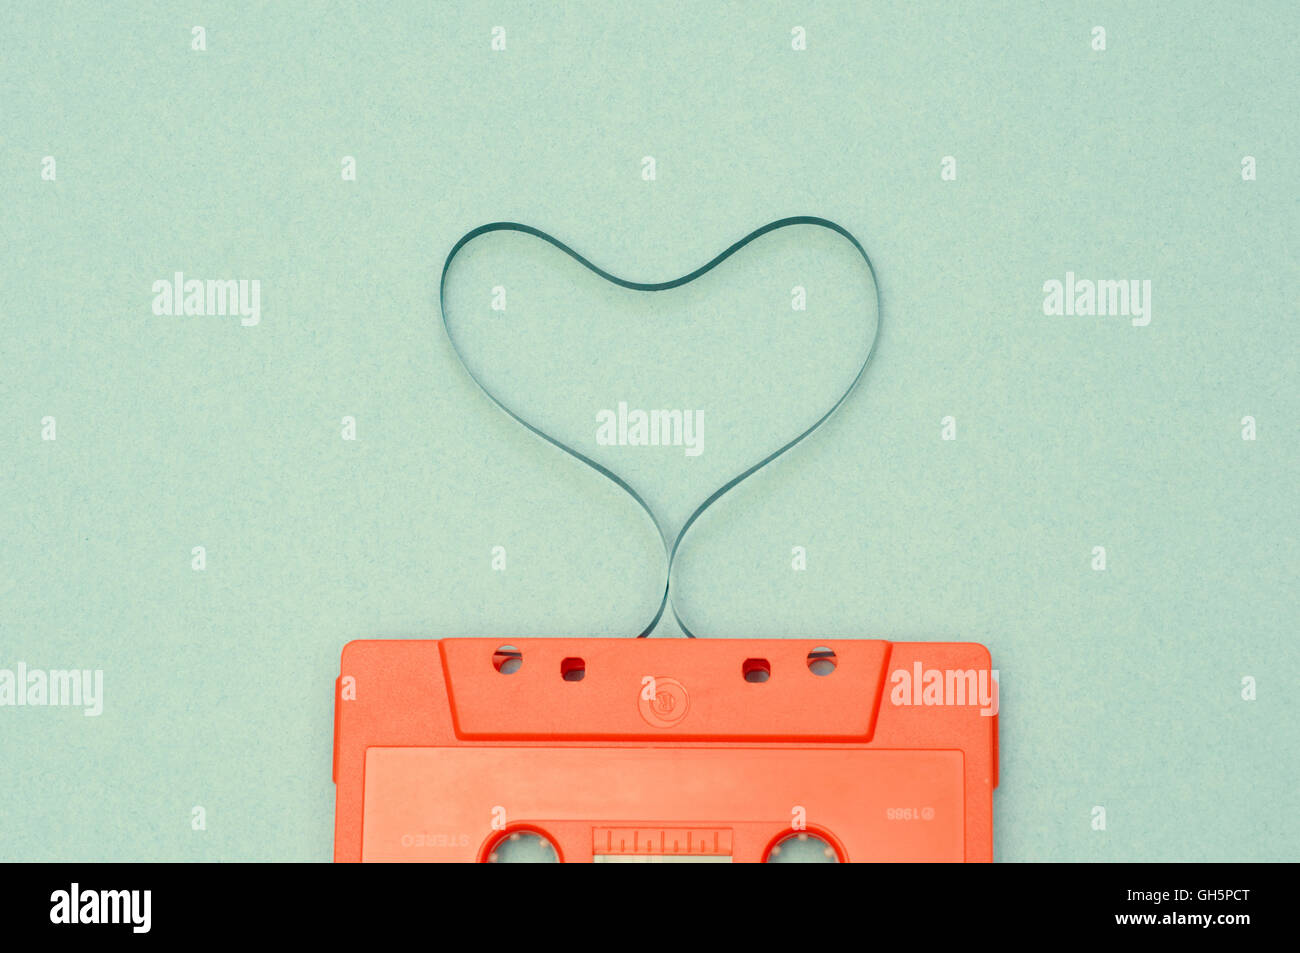 Heart shaped audio tape - Stock Image